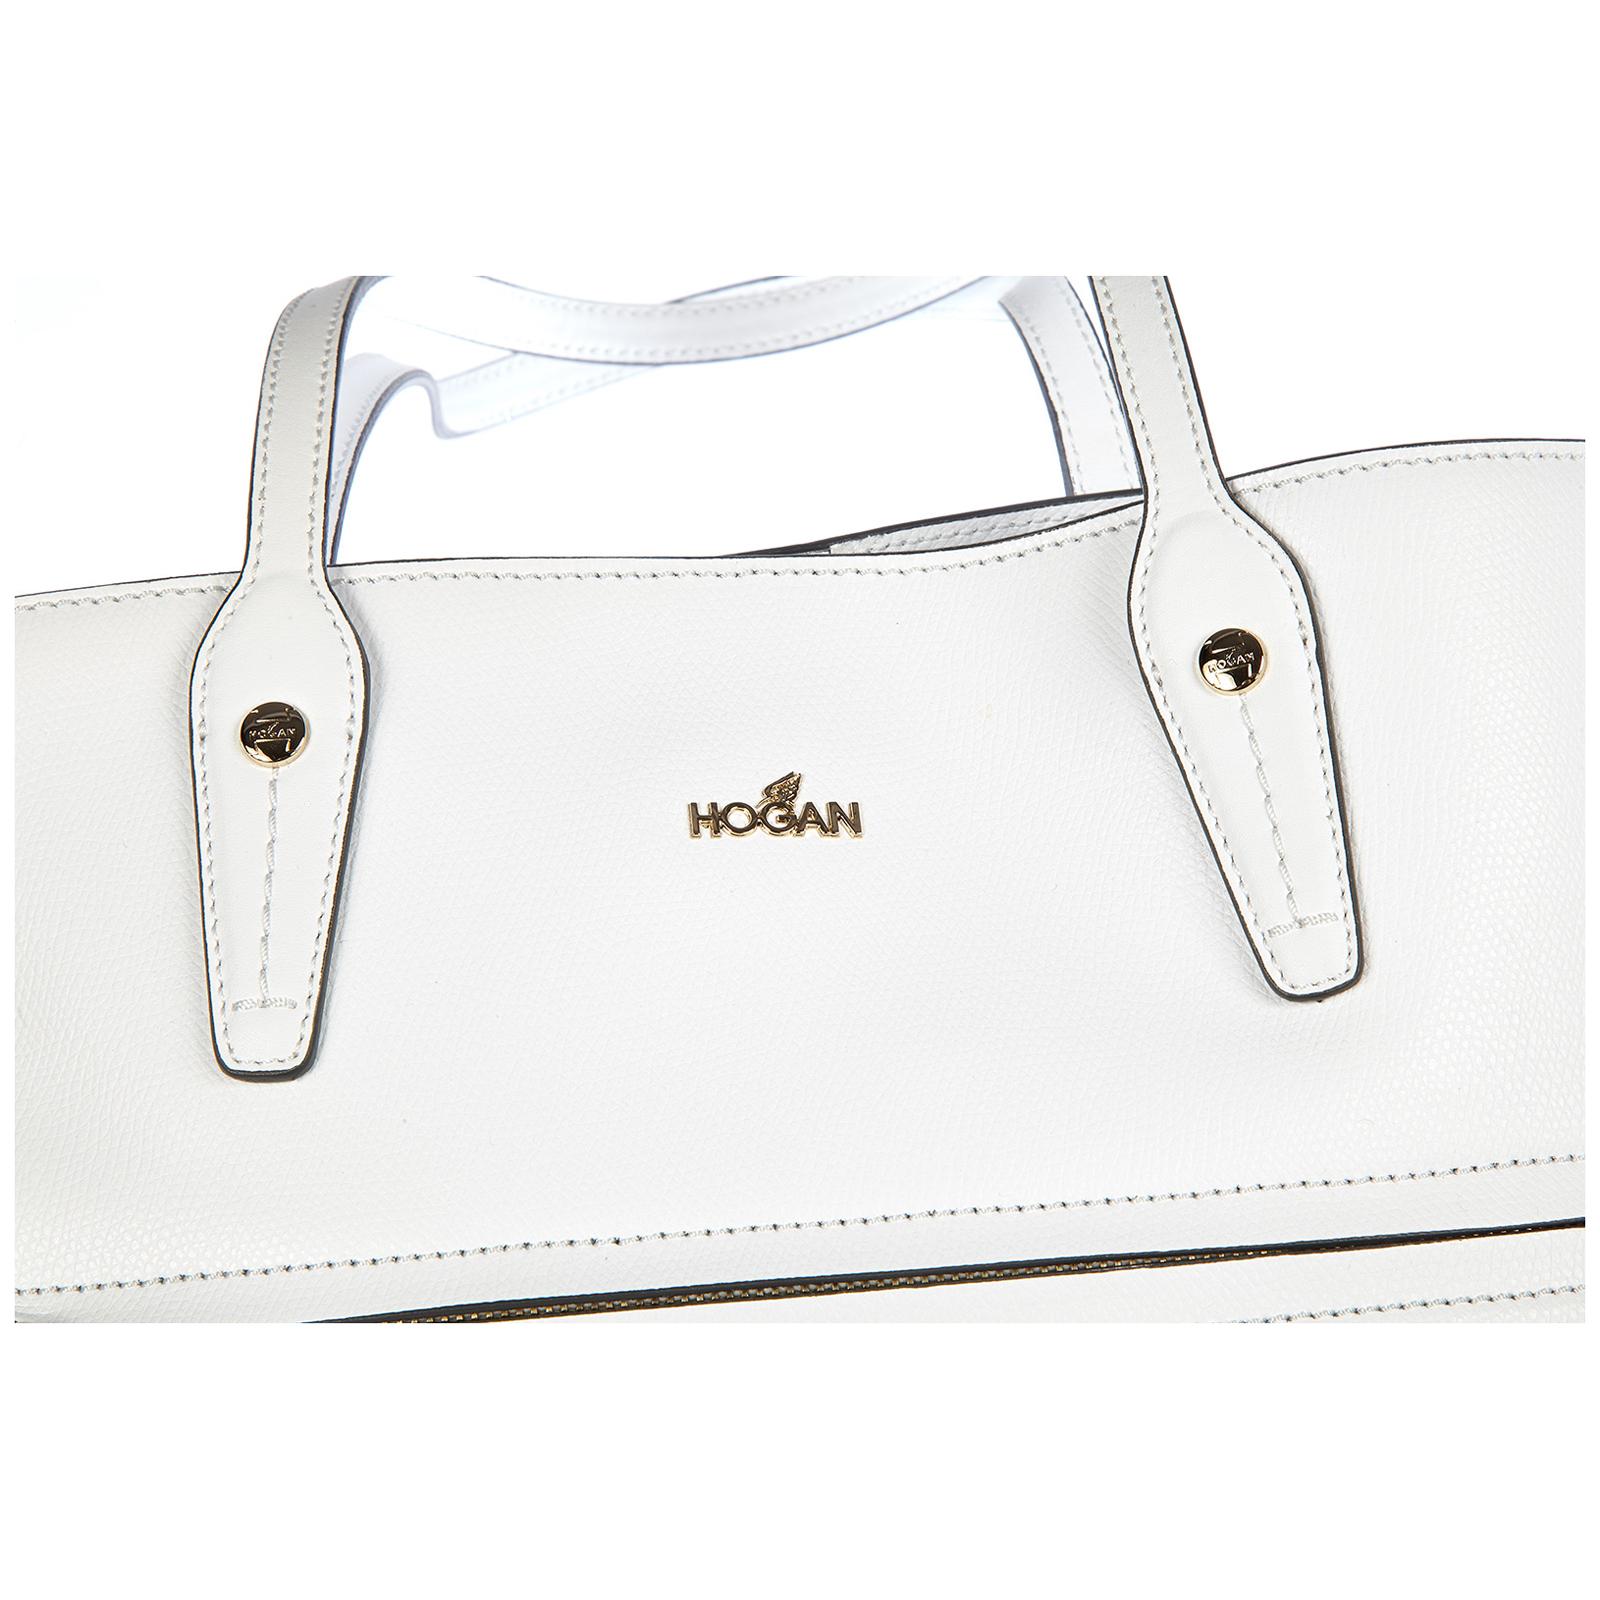 49b97ce062a8 ... Women s leather shoulder bag print base verticale sfoderata ...